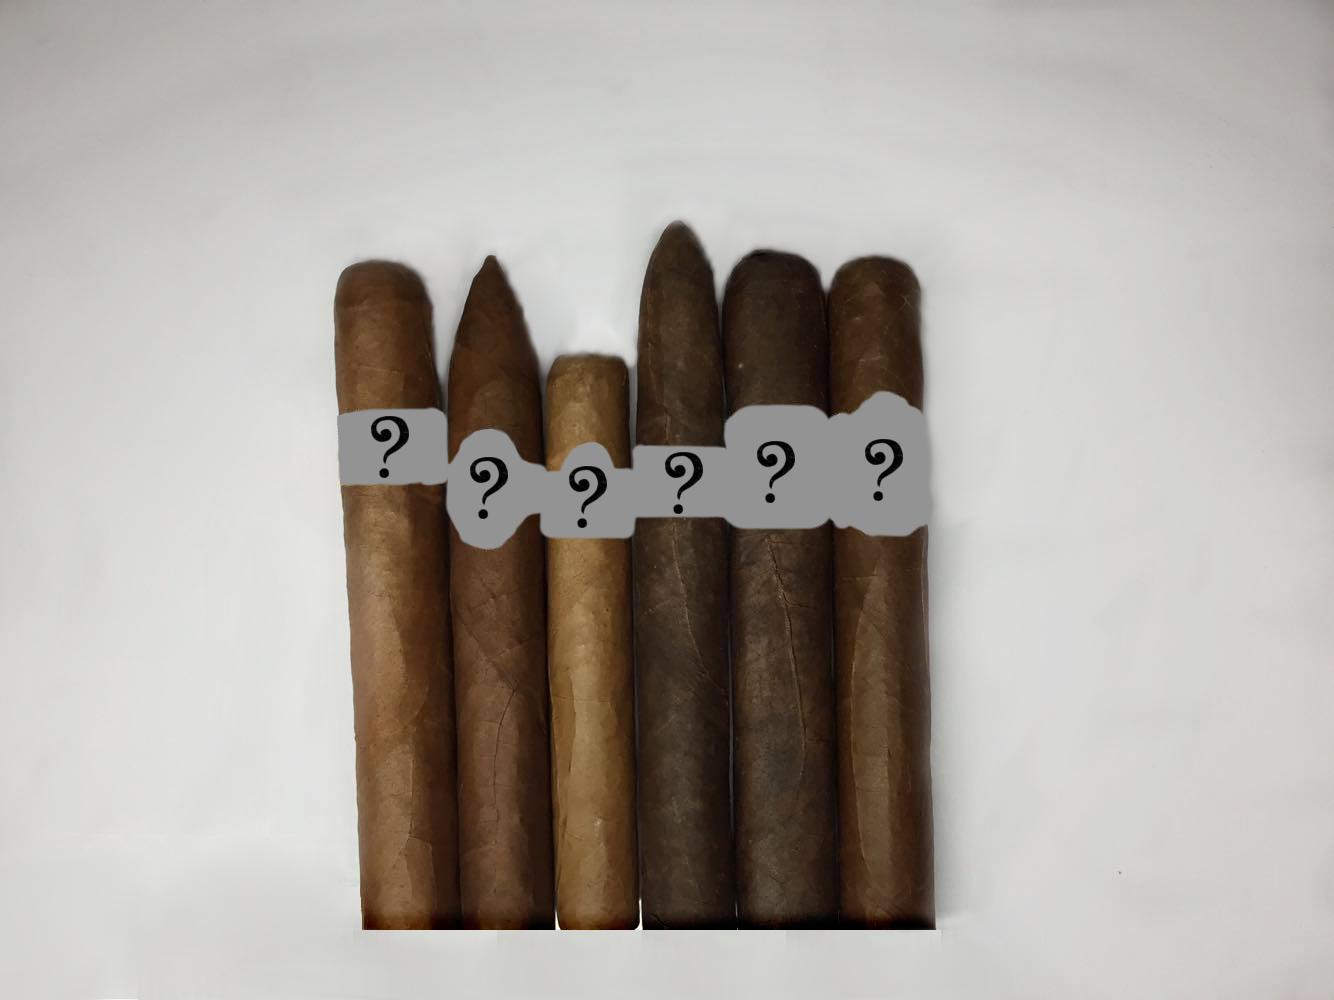 Zigarren ohne Ring